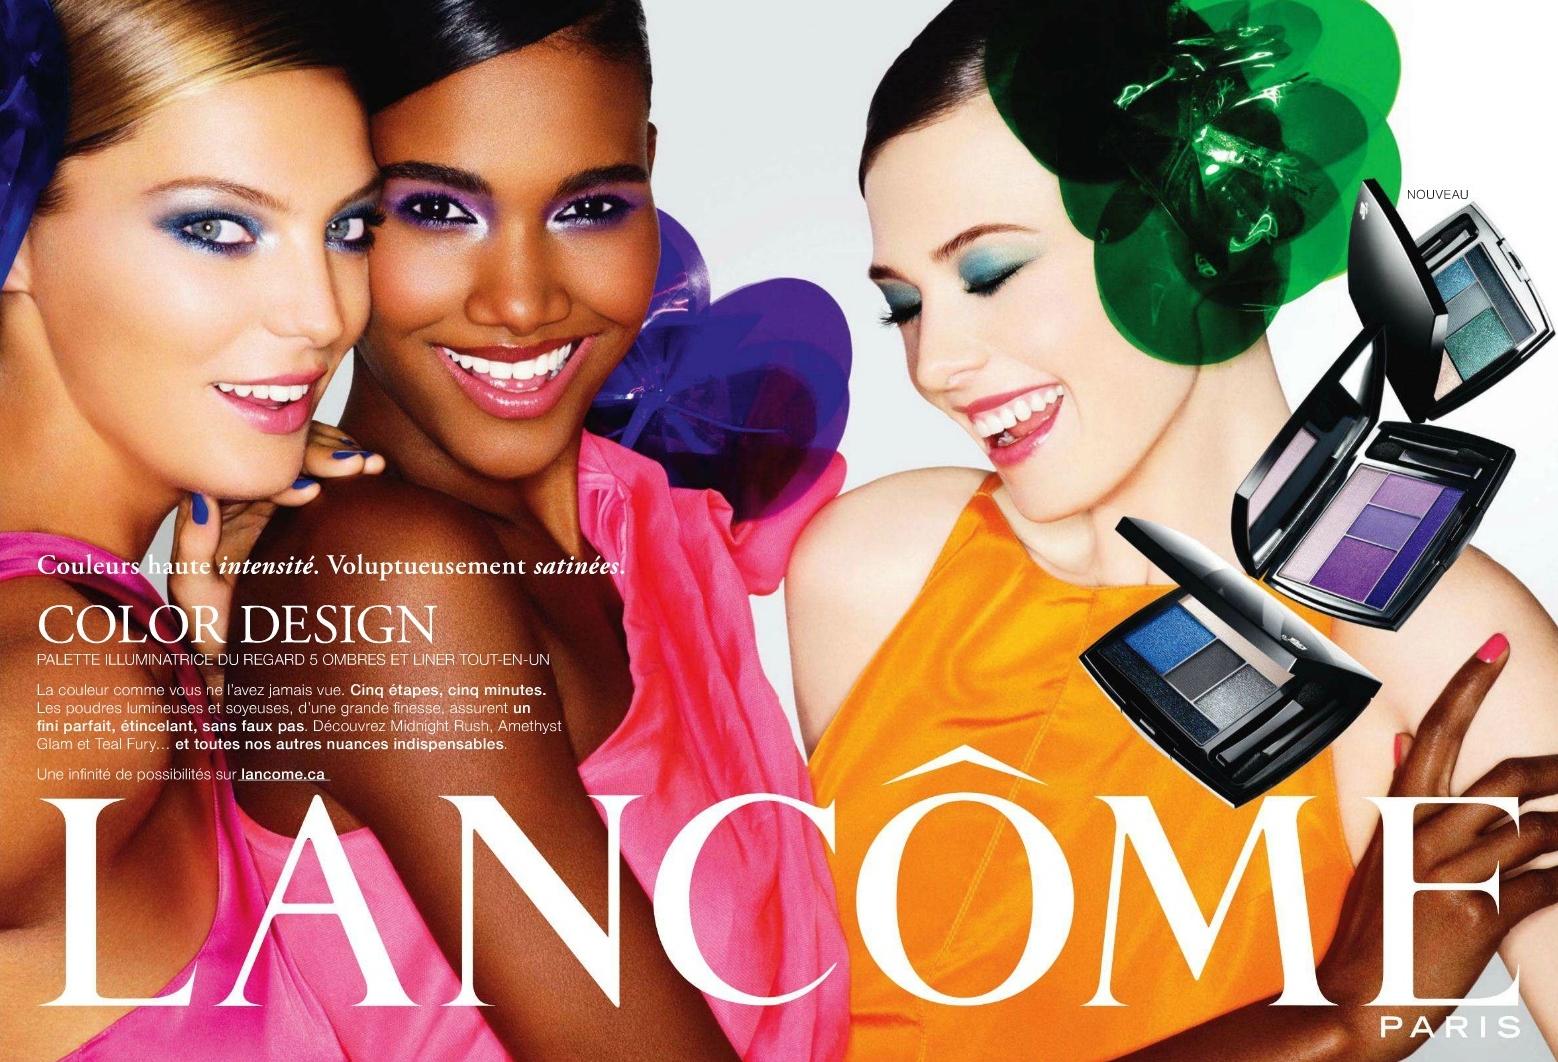 daftar merek branded perusahaan kosmetik makeup produk kecantikan beauty salon kapster advisor blogger vlogger beautician therapist impor luar lokal review cara tips pemakaian kelebihan kelemahan bahan kandungan terkenal ternama populer favorit bagus